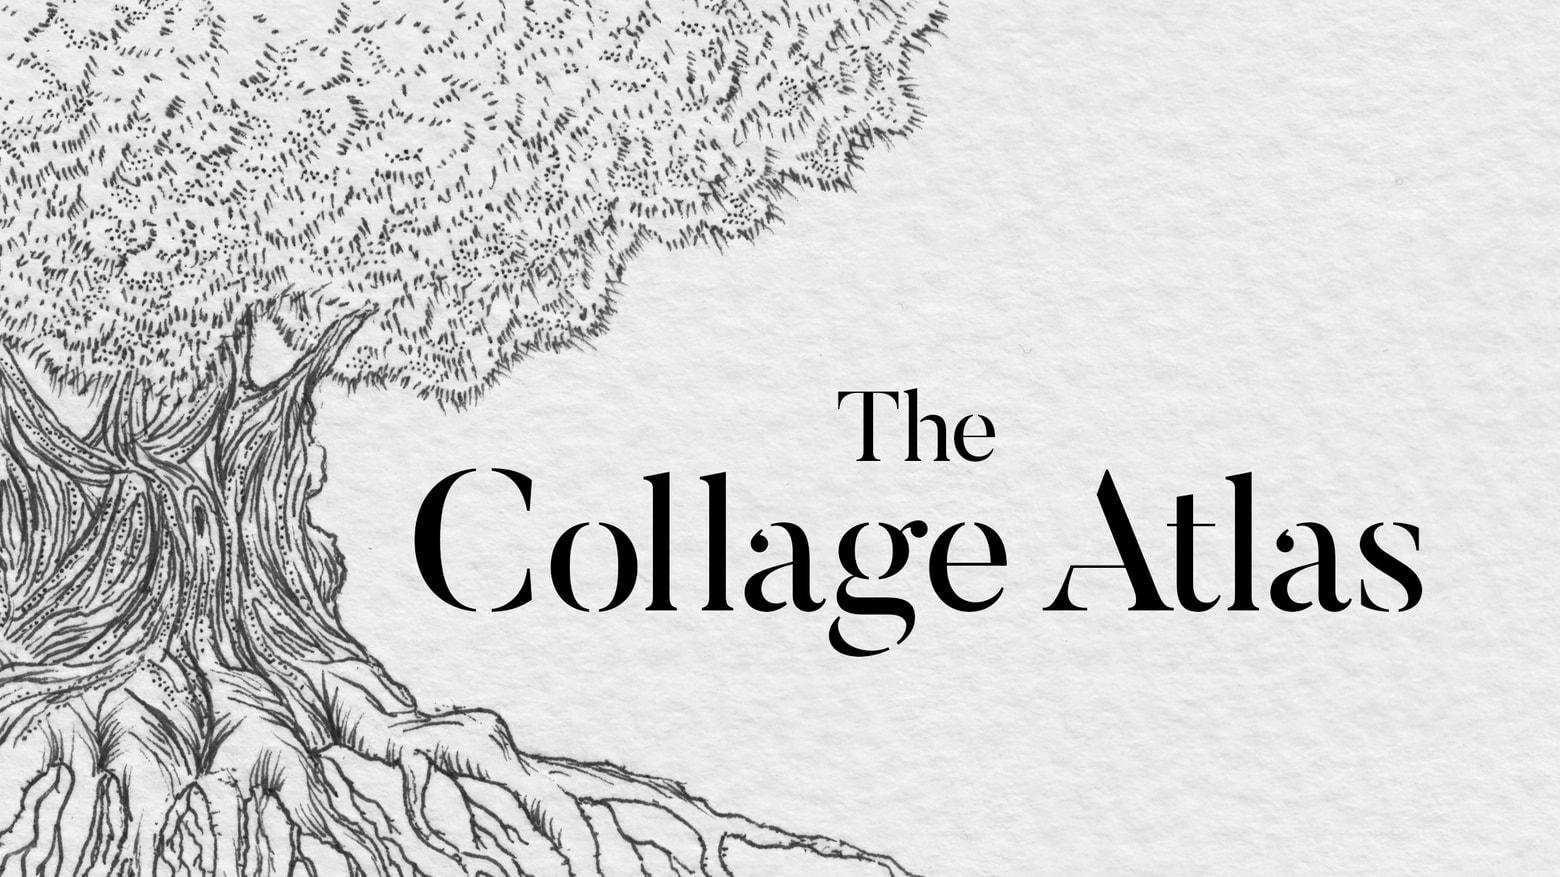 Take a meditative walk through a hand-drawn world in The Collage Atlas on Apple Arcade